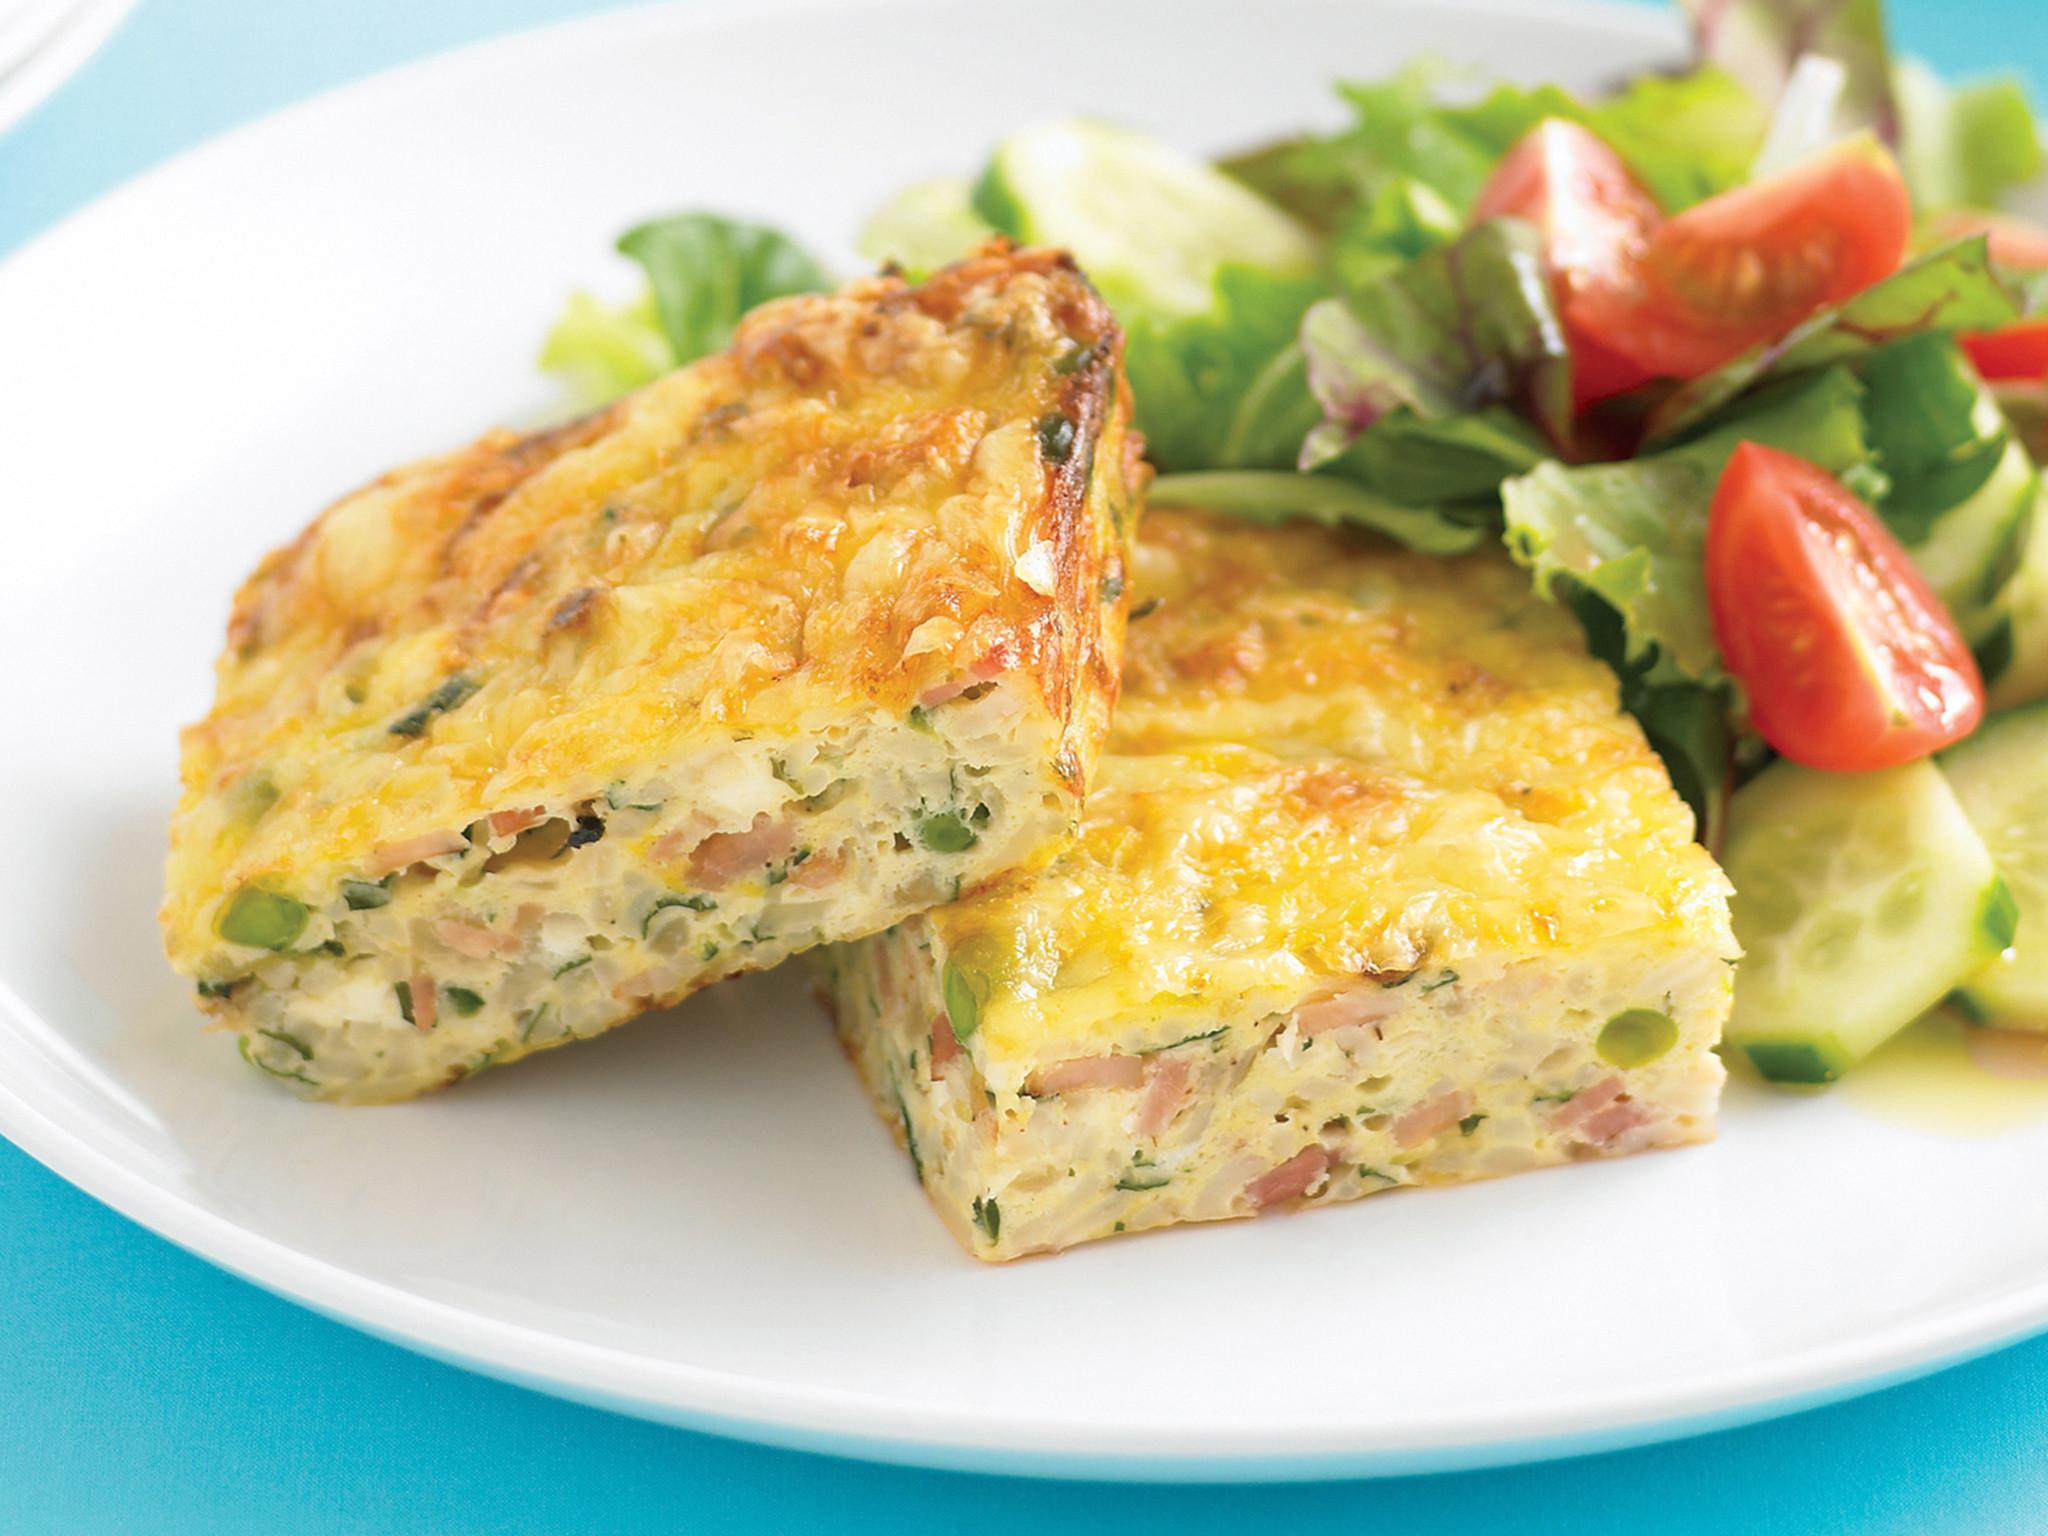 Zucchini Recipe Healthy  easy ve arian zucchini slice recipe